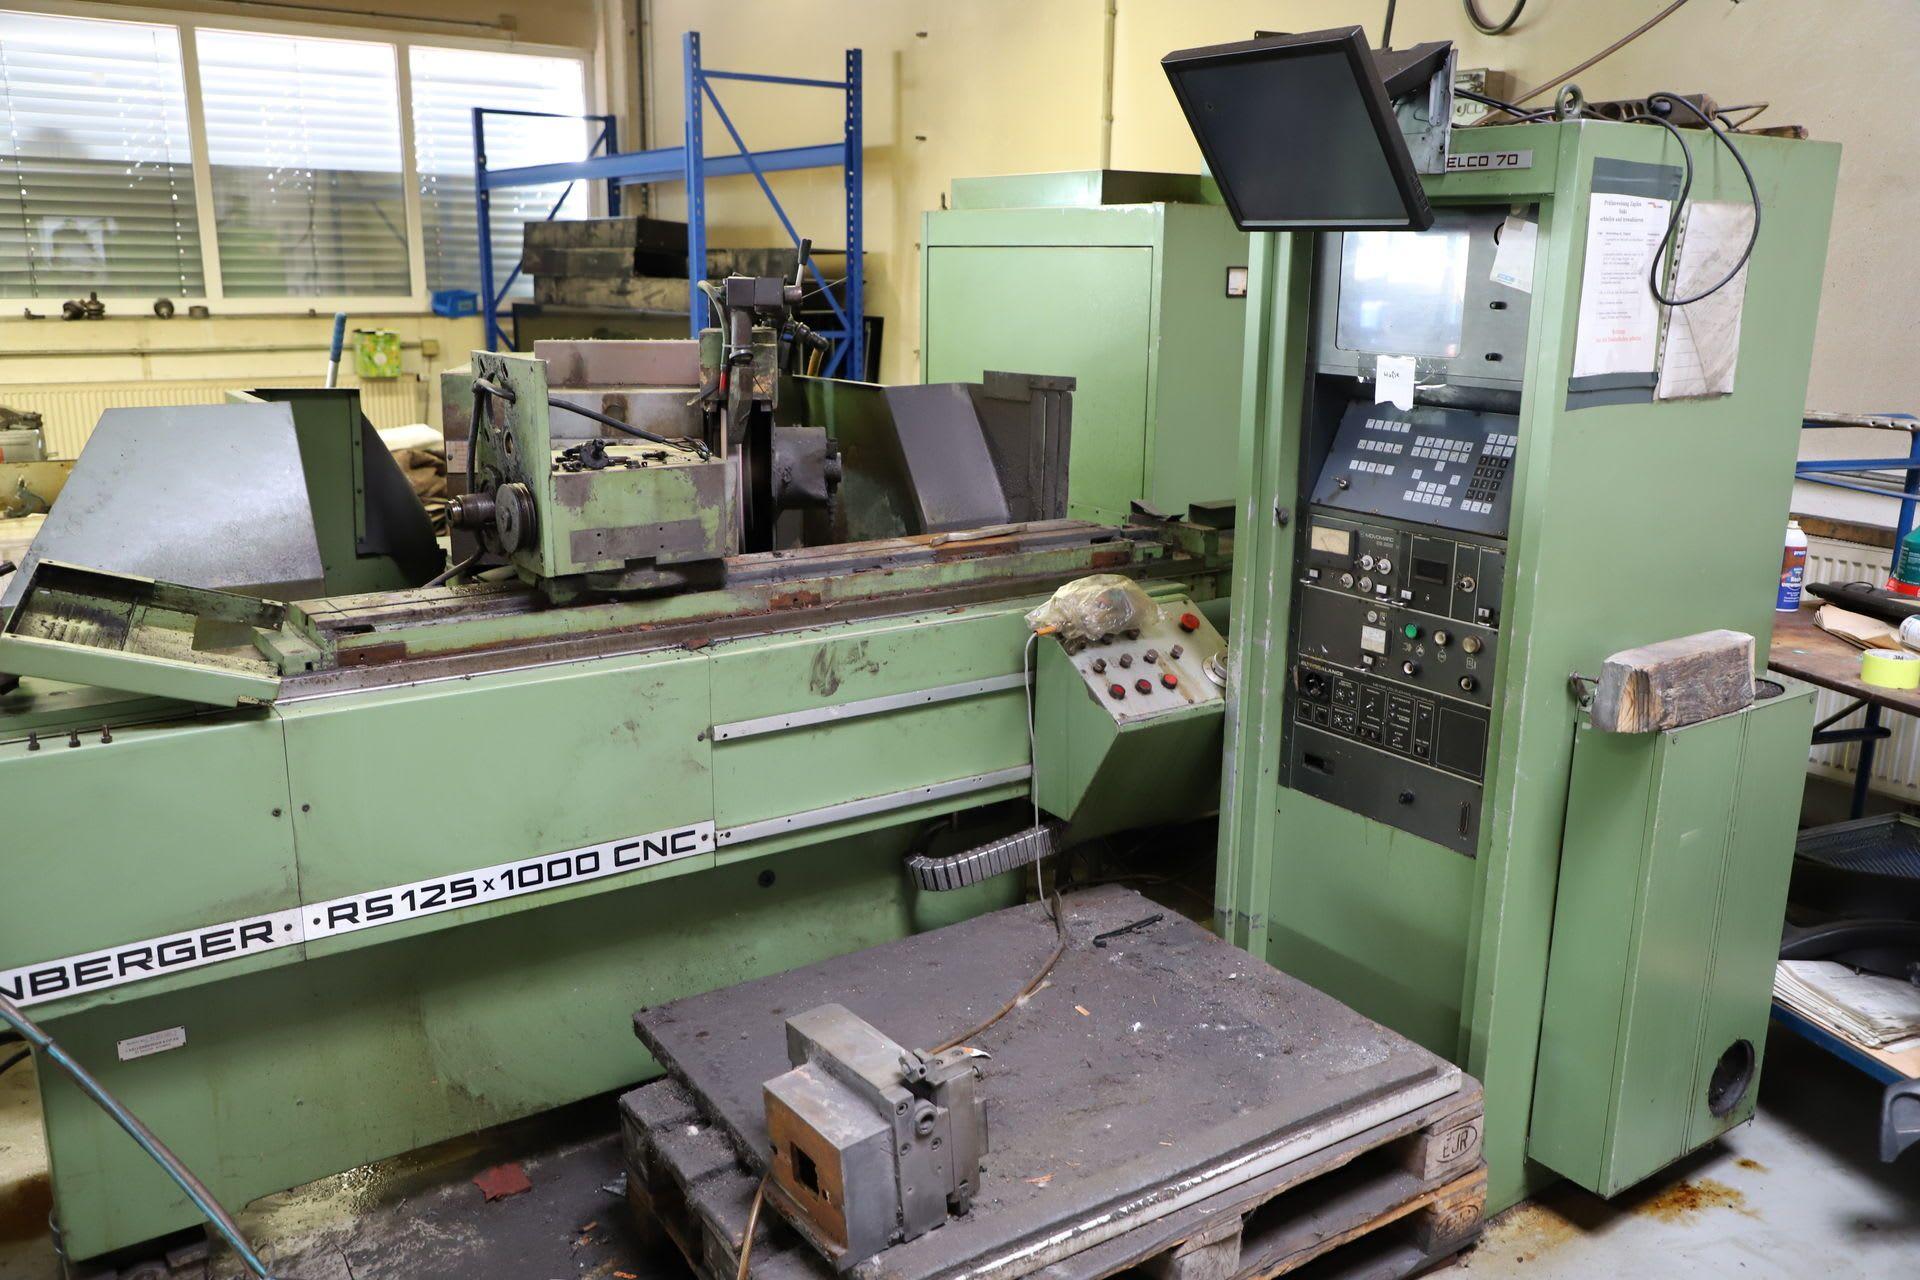 KELLENBERGER RS 125 x 1000 CNC CNC Rundschleifmaschine